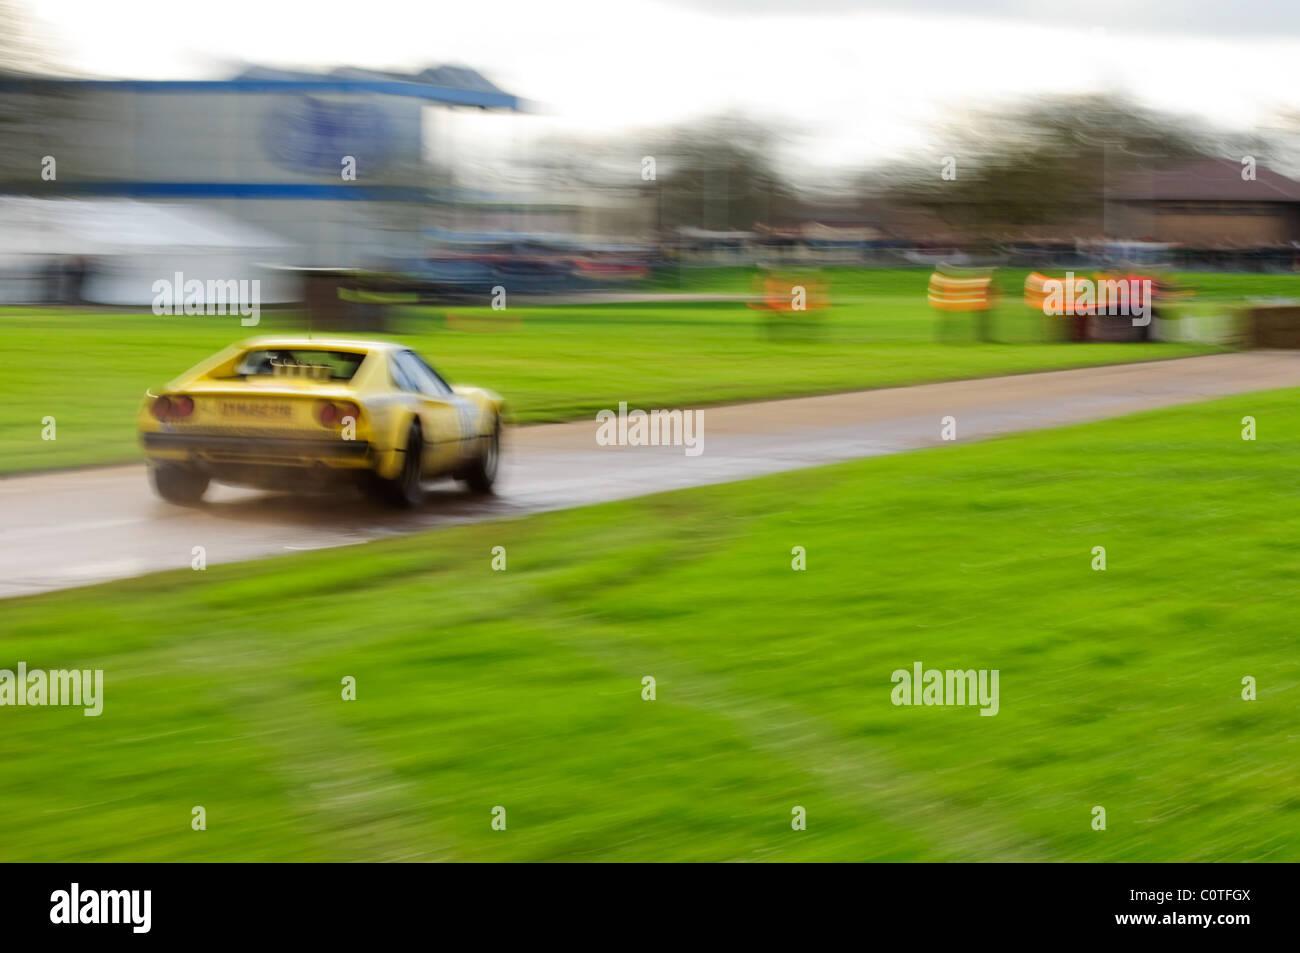 1986 Ferrari 308 GTB, Tony Worswick - Race Retro, Stoneleigh Park - Stock Image